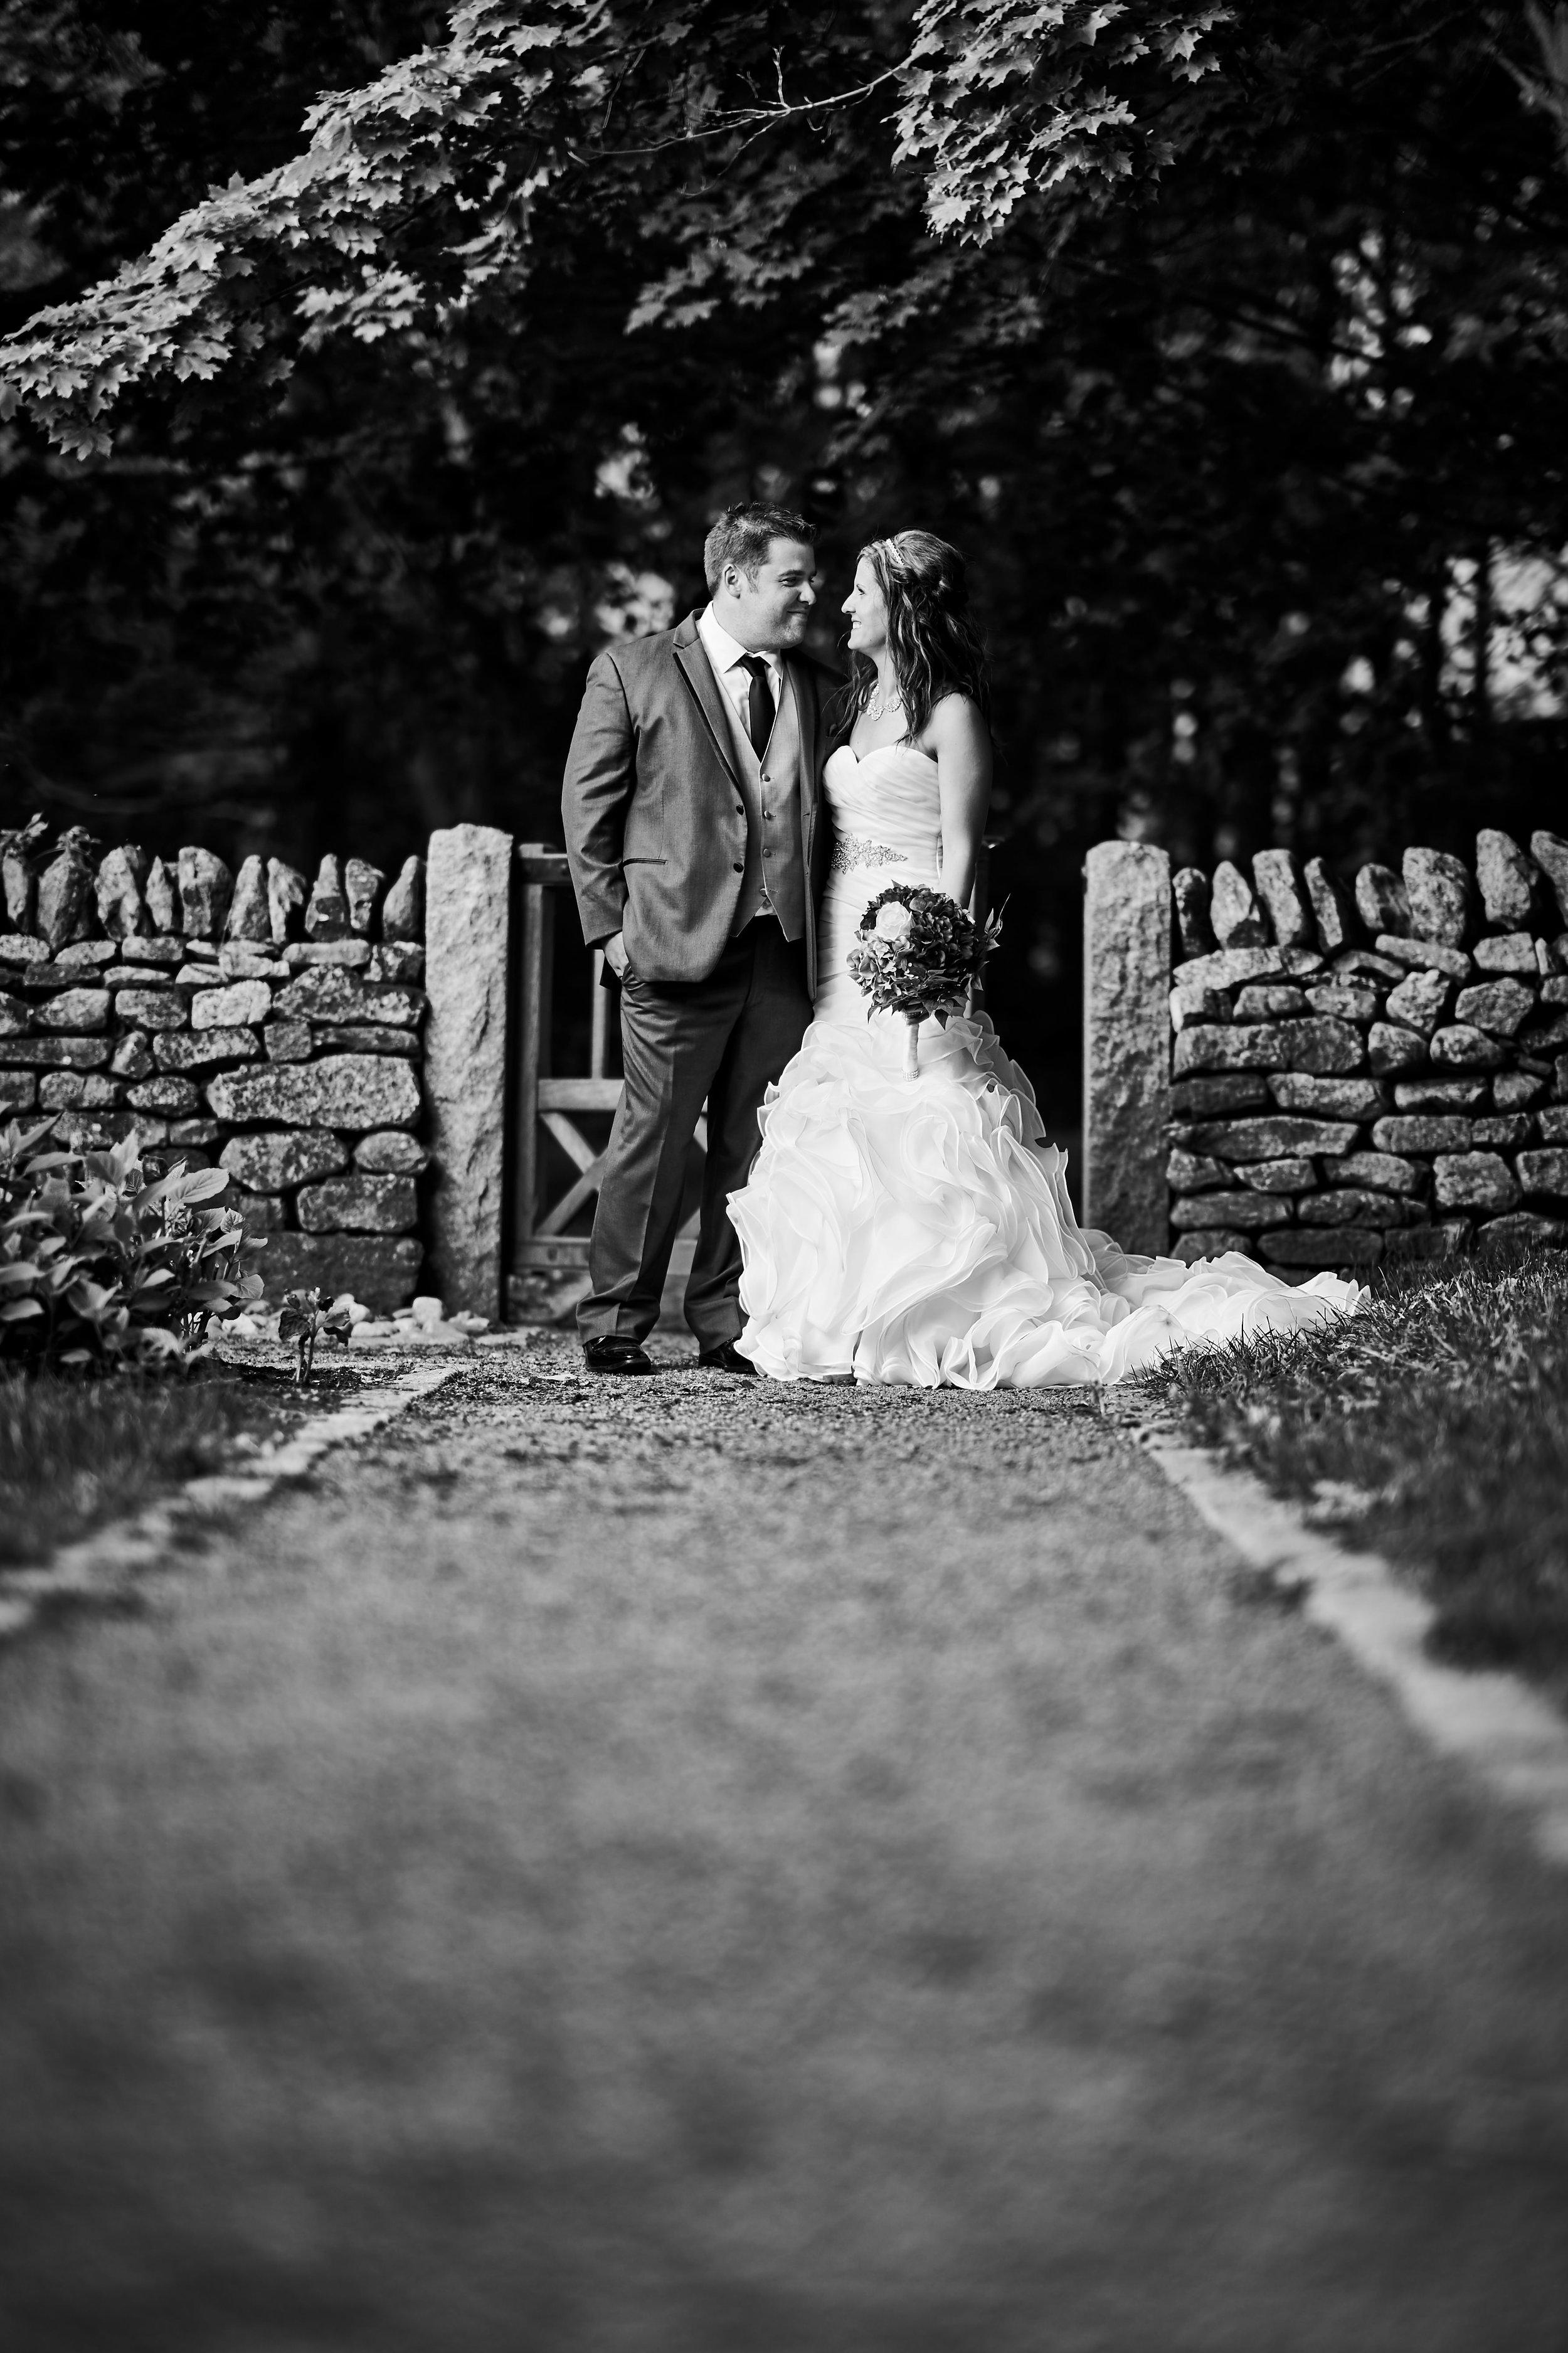 Jérémie & Julie's Wedding - 464.jpg